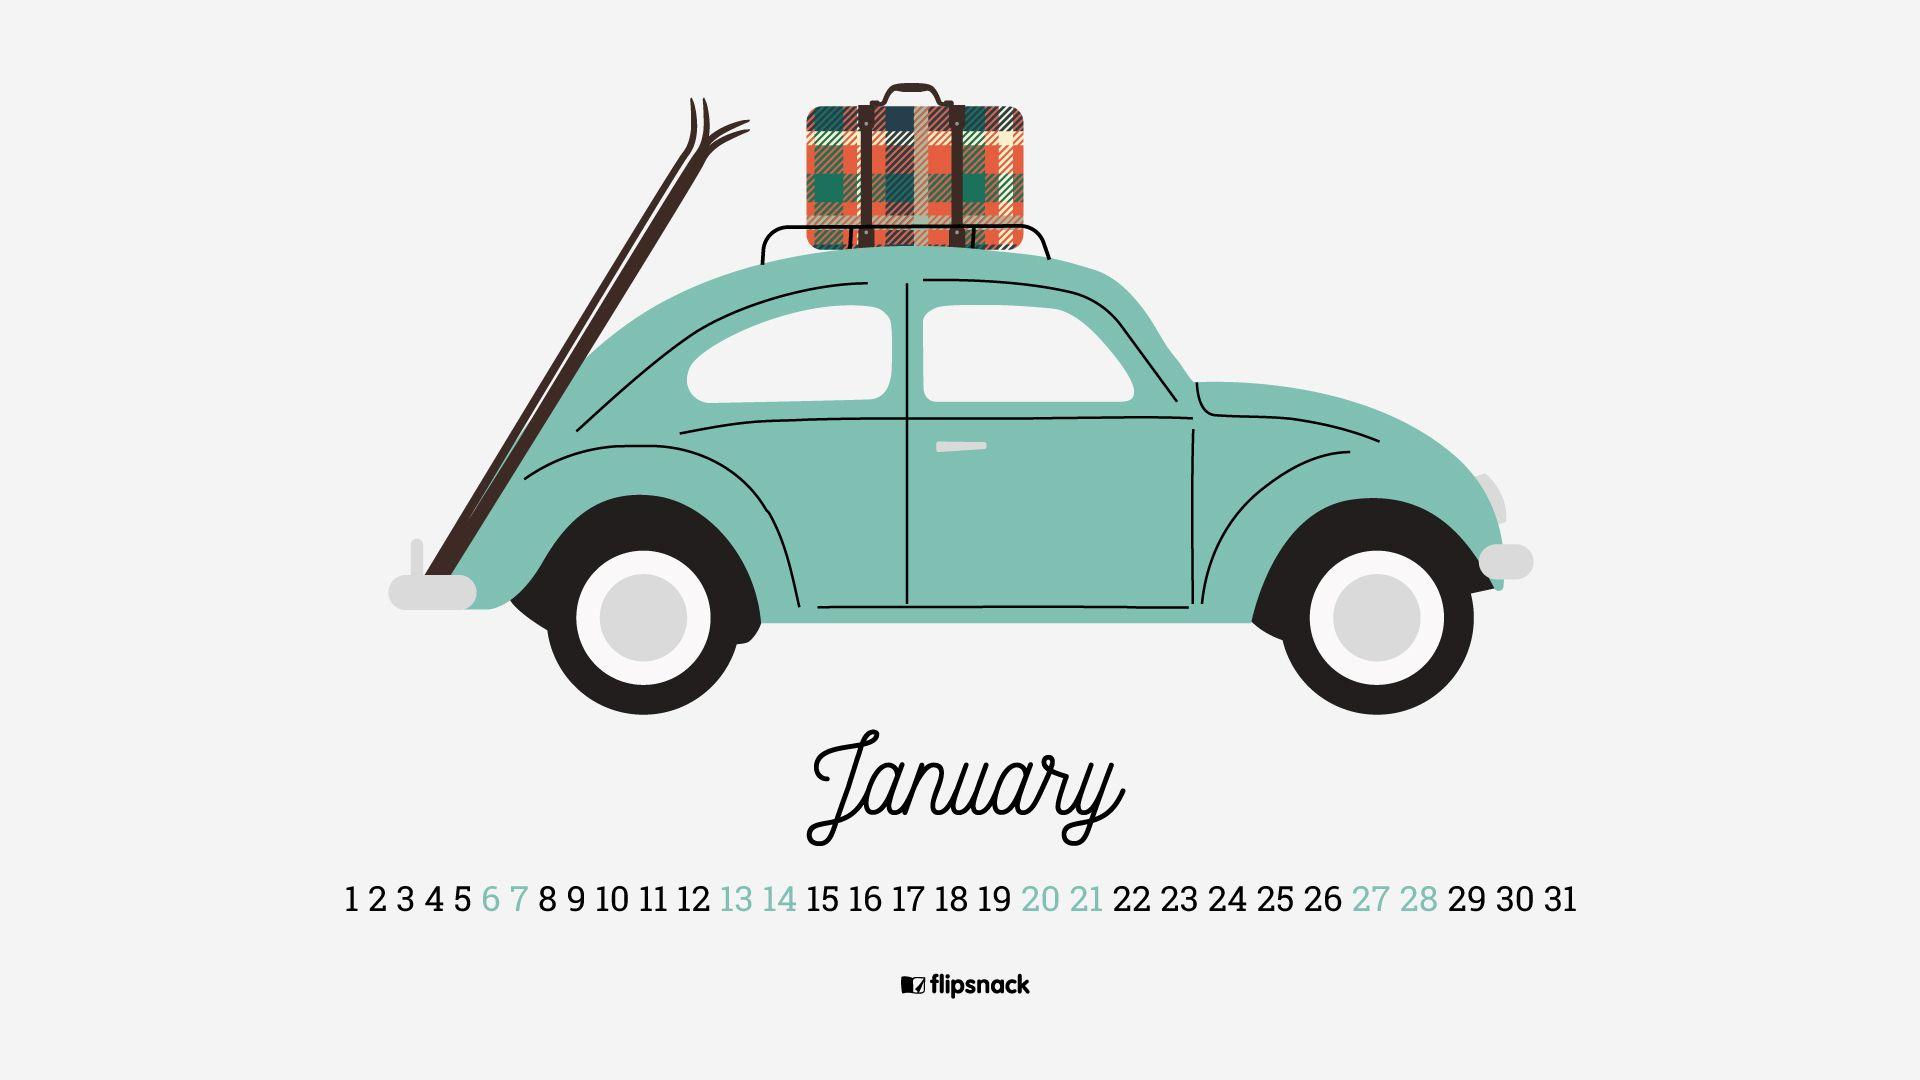 January 2018 Calendar Wallpapers 1920x1080